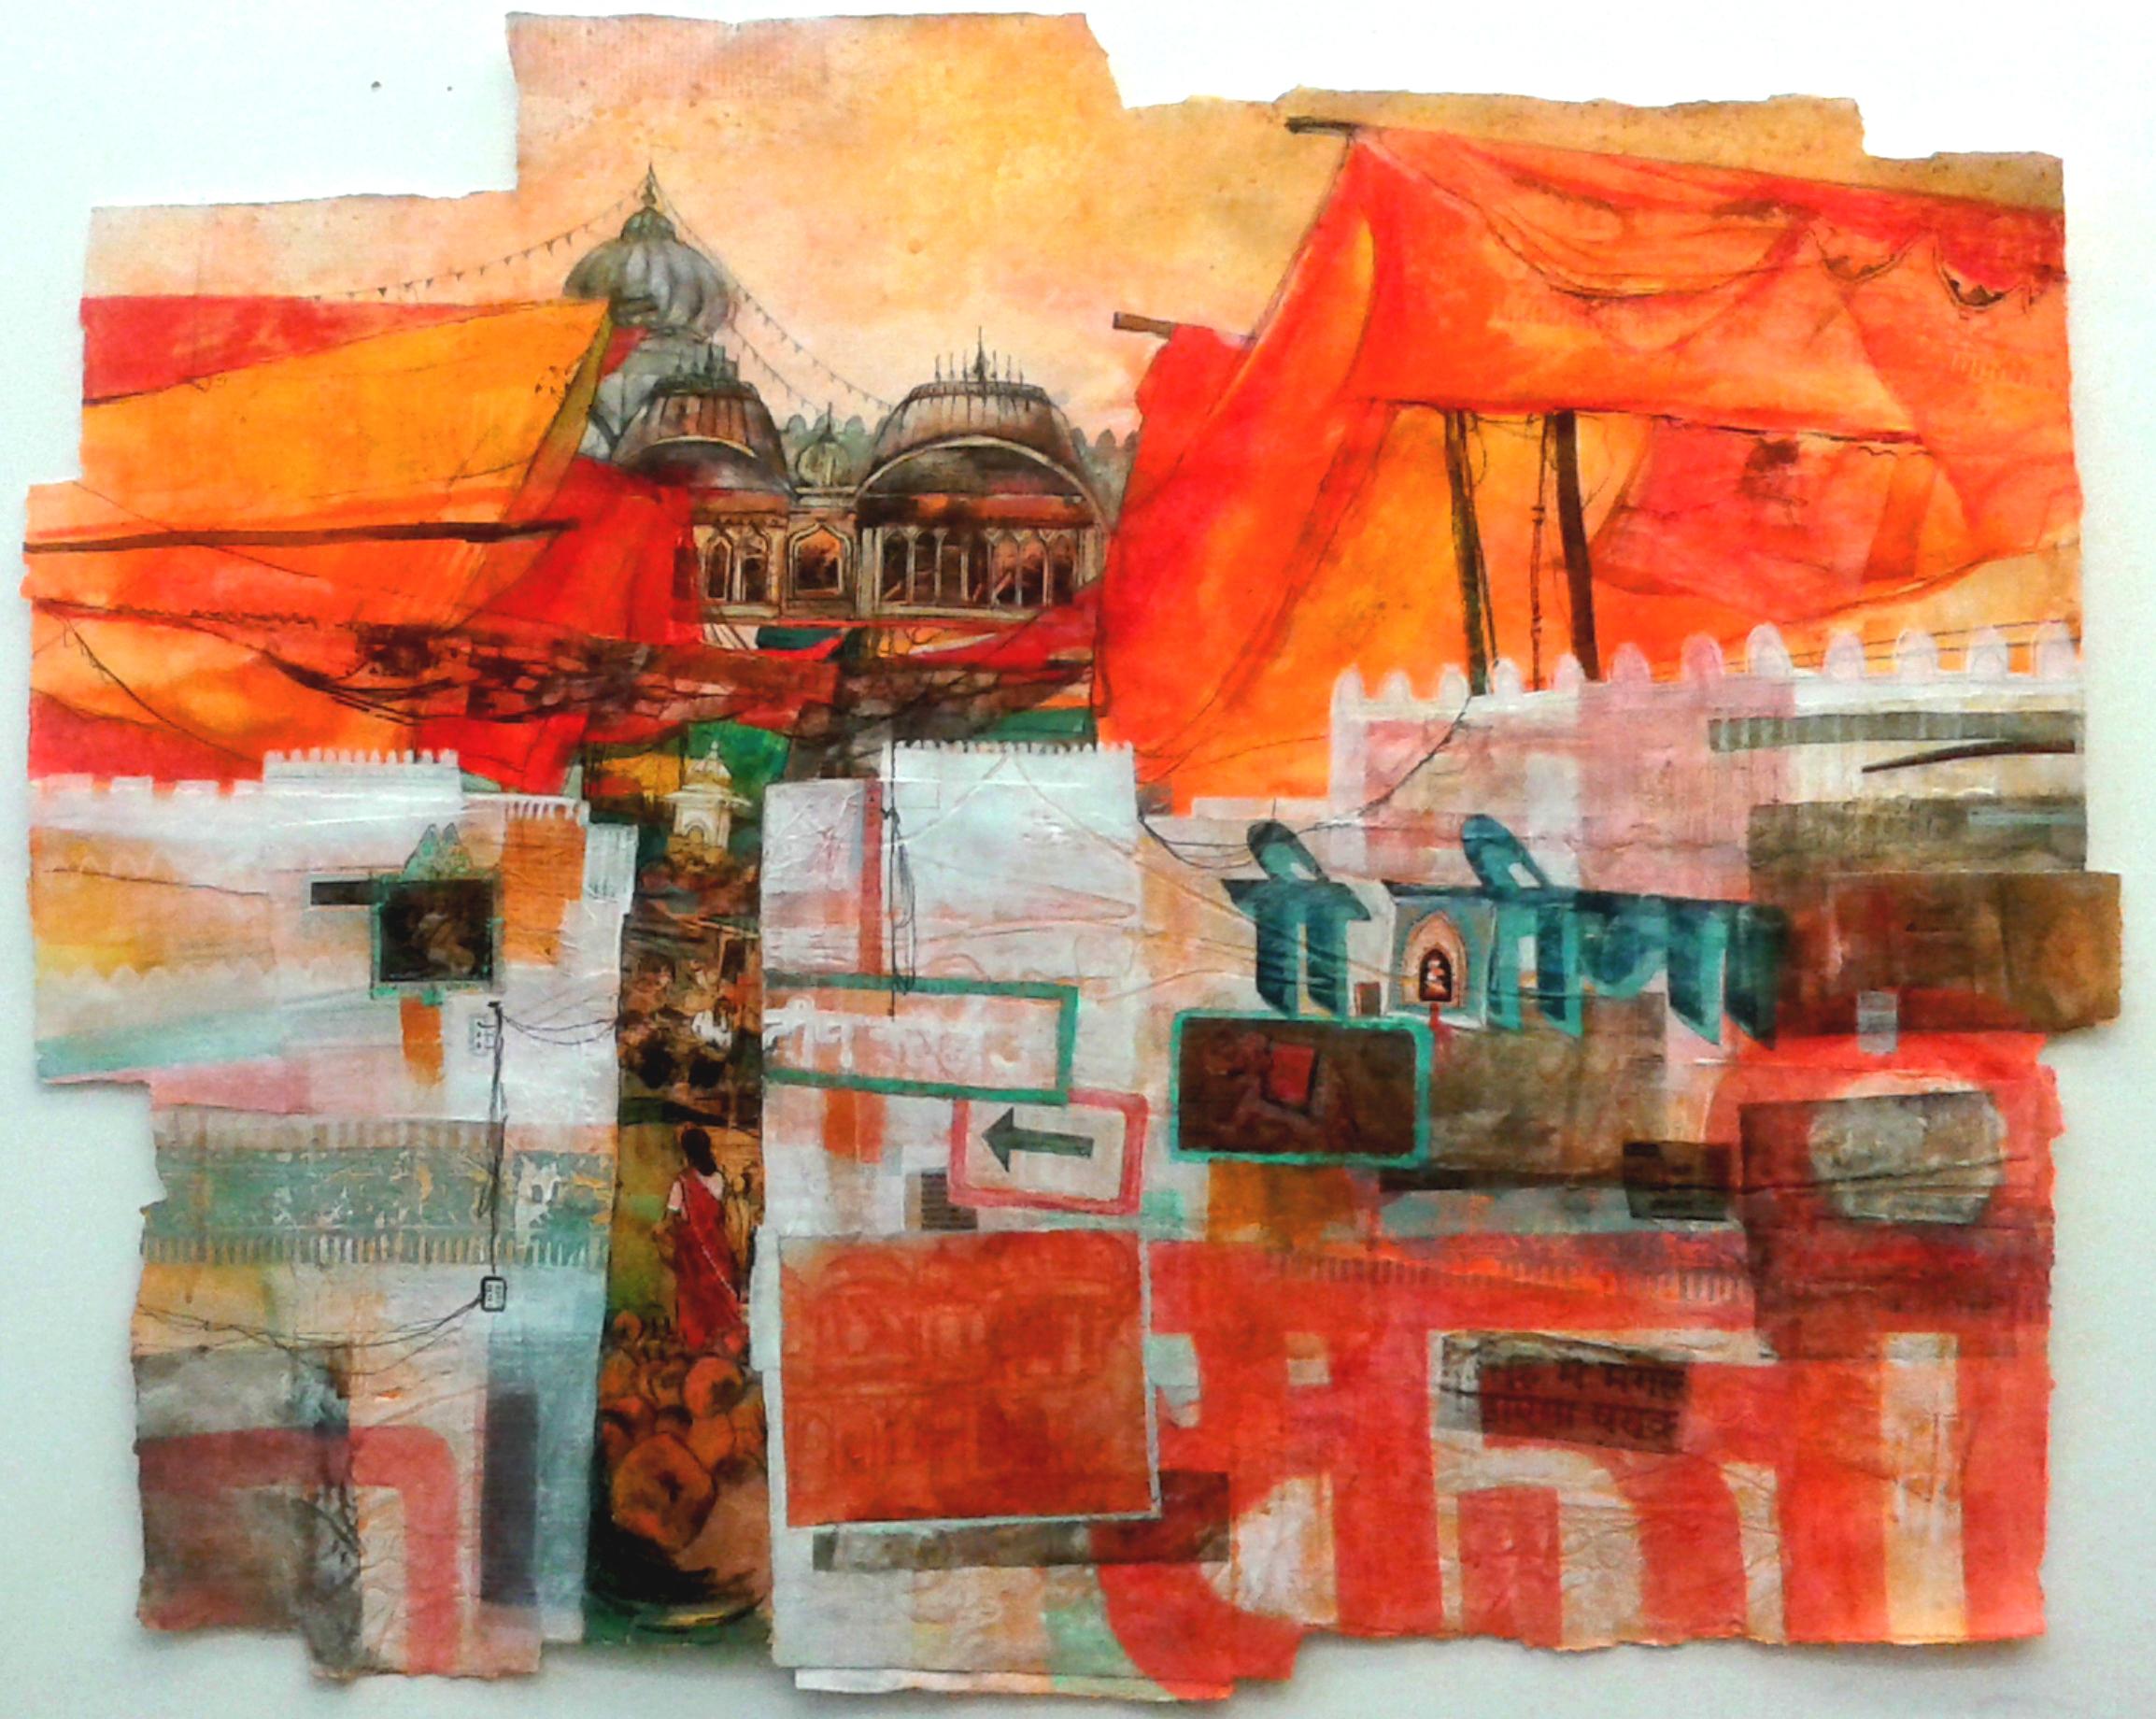 Glimpse of the Bazaar